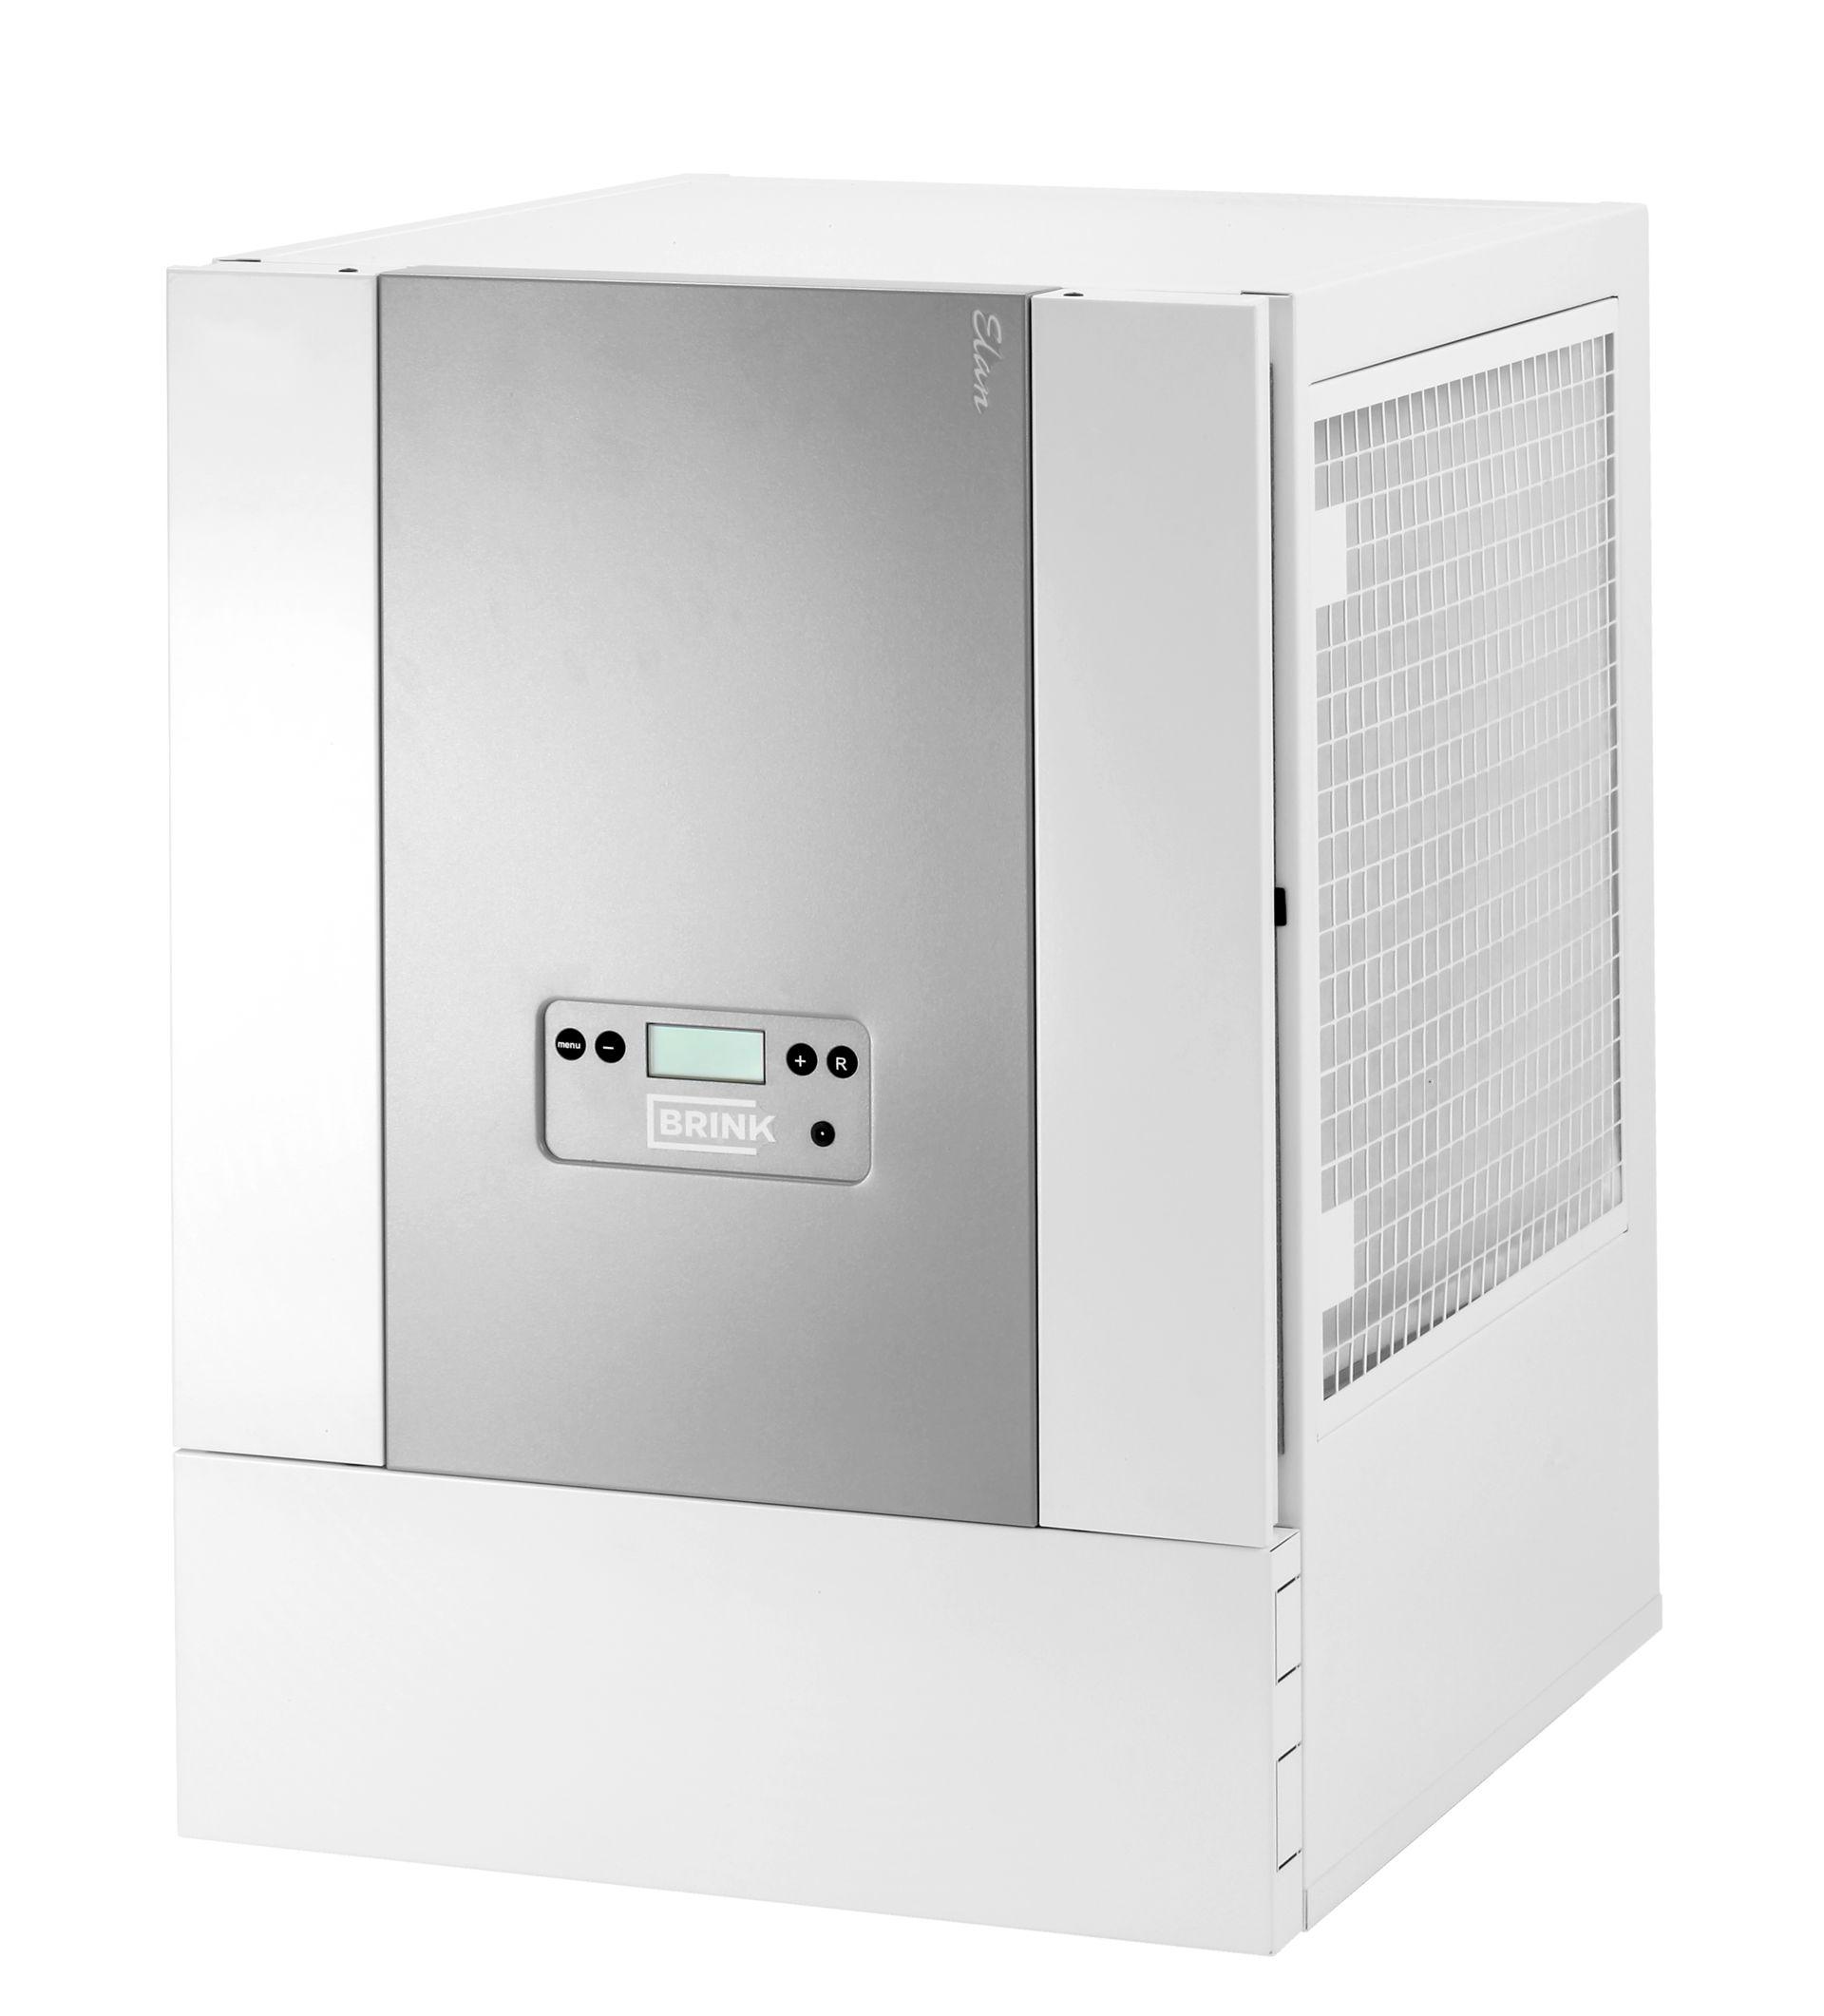 Uitzonderlijk Elan 25 2.1 luchtverwarmer - brinkairshop.nl OI32